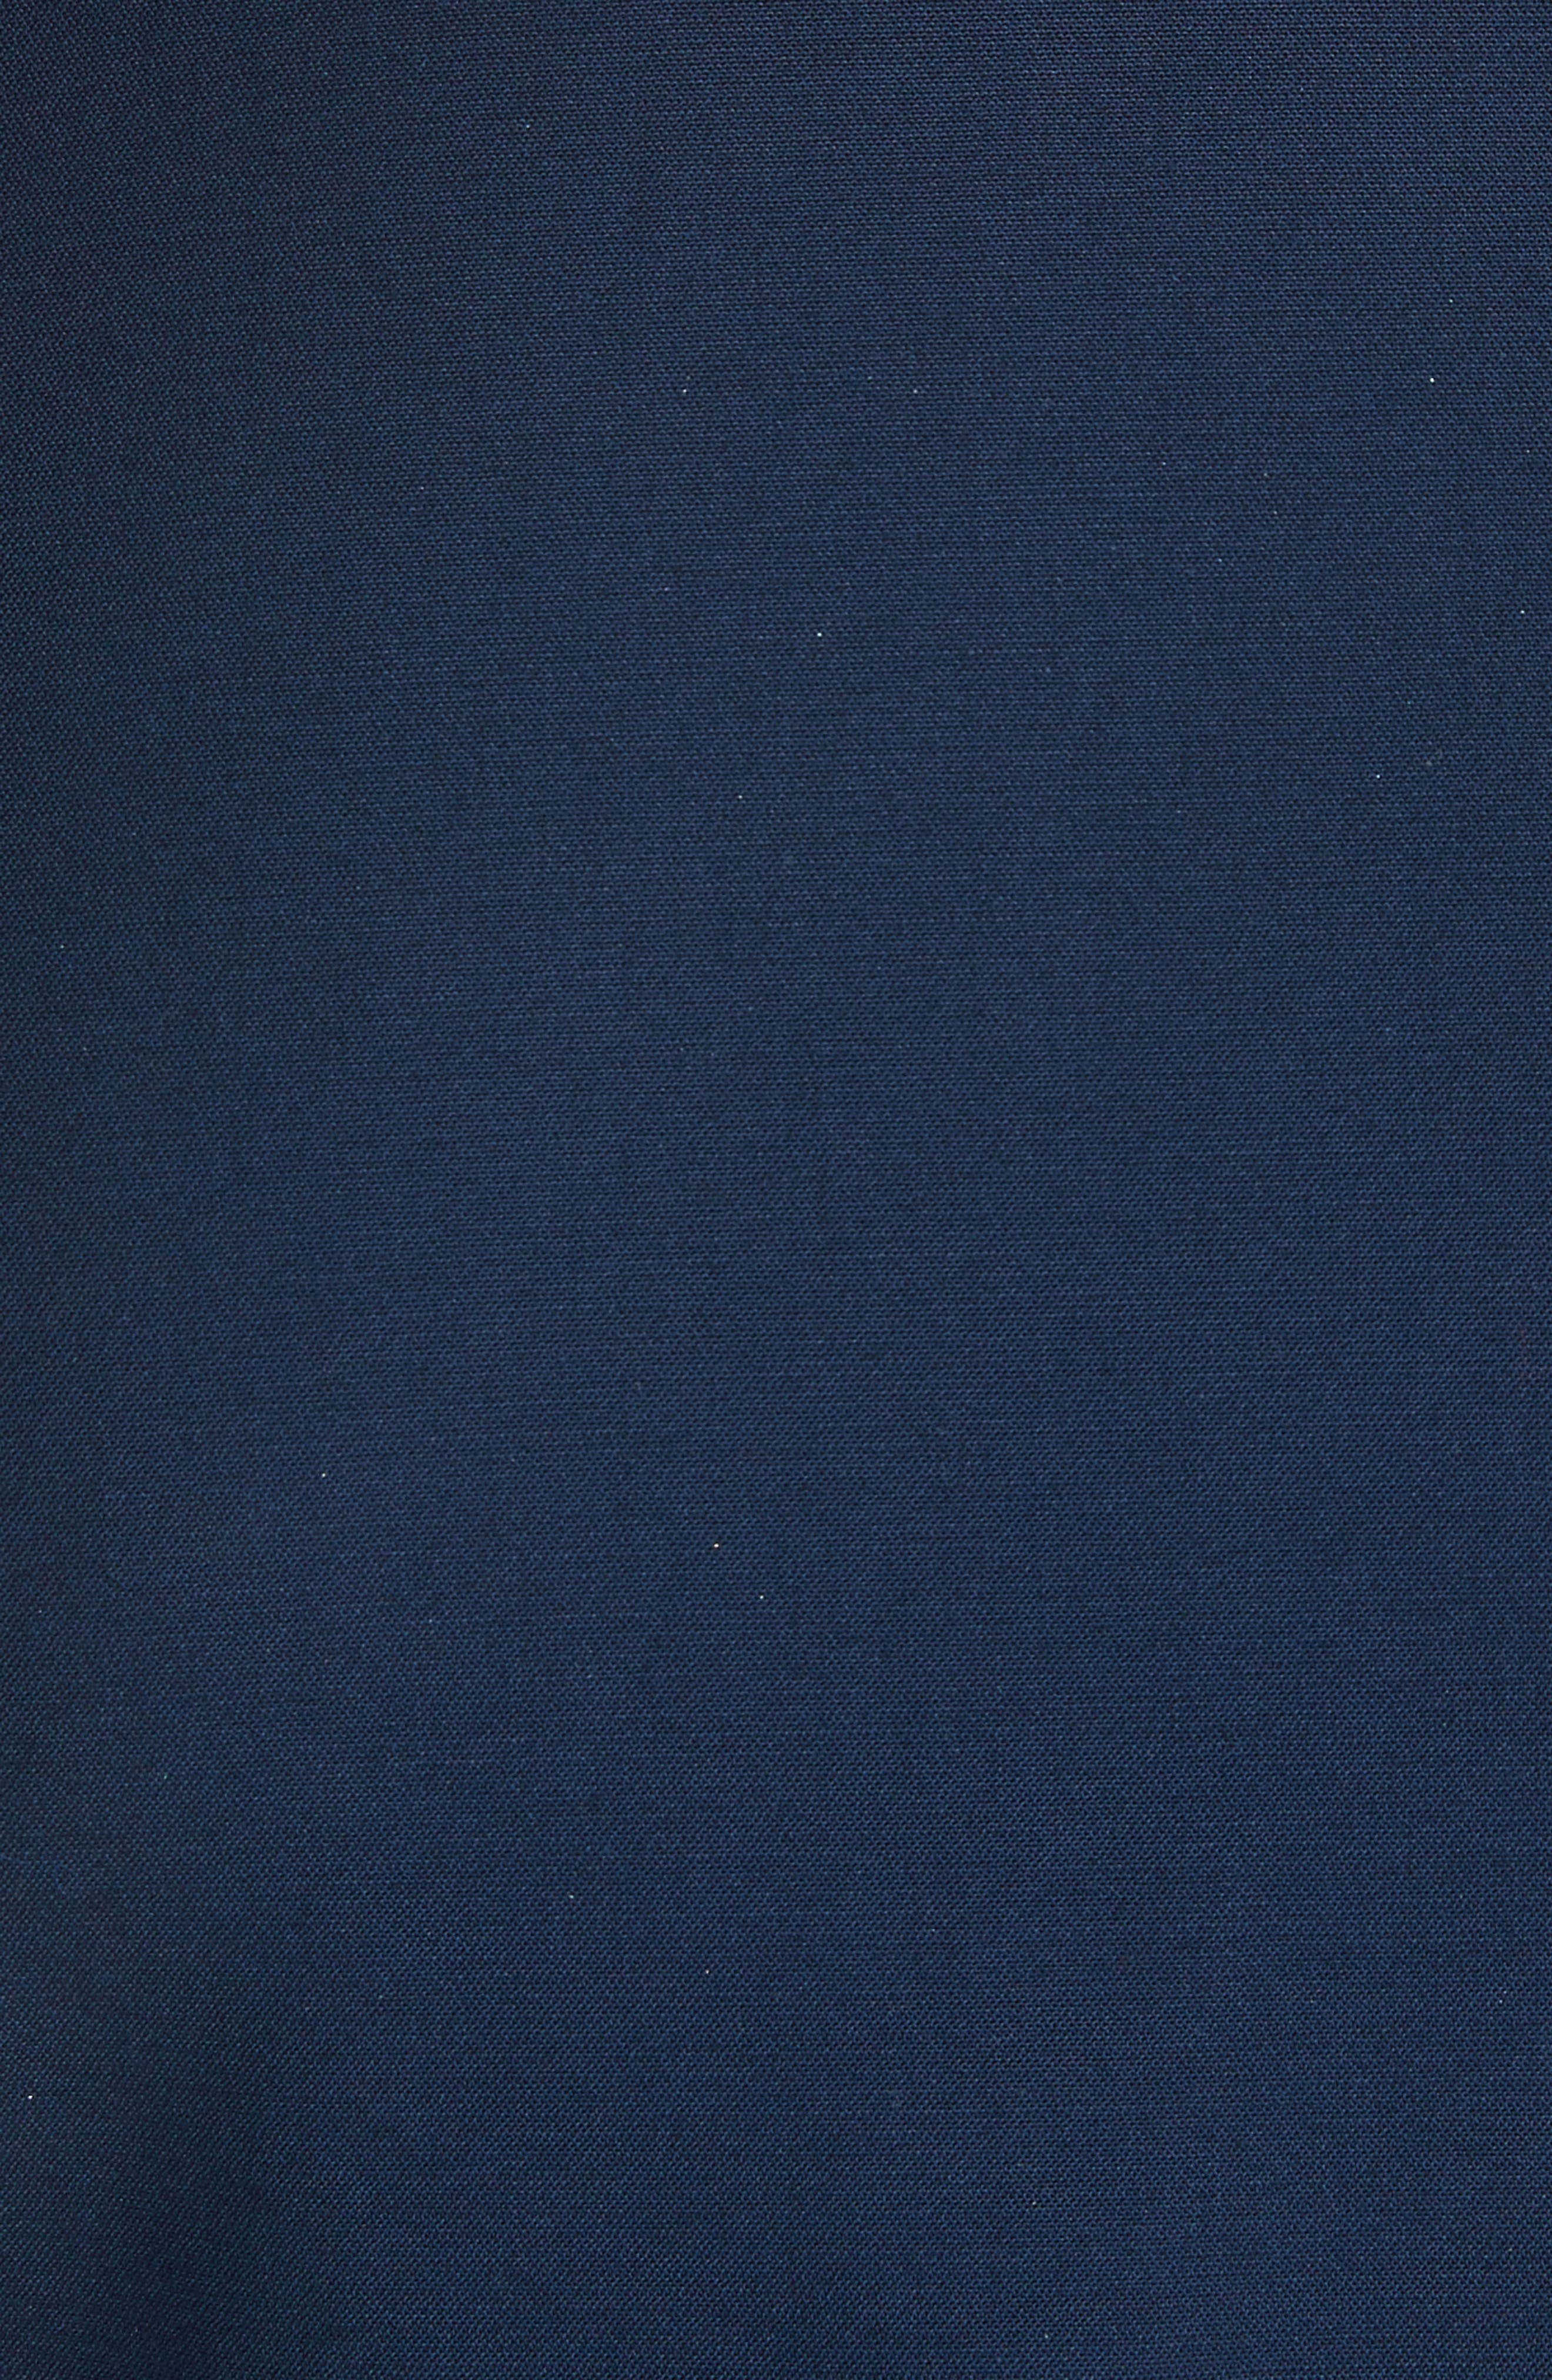 Ruffle Pocket A-Line Dress,                             Alternate thumbnail 5, color,                             Oceano